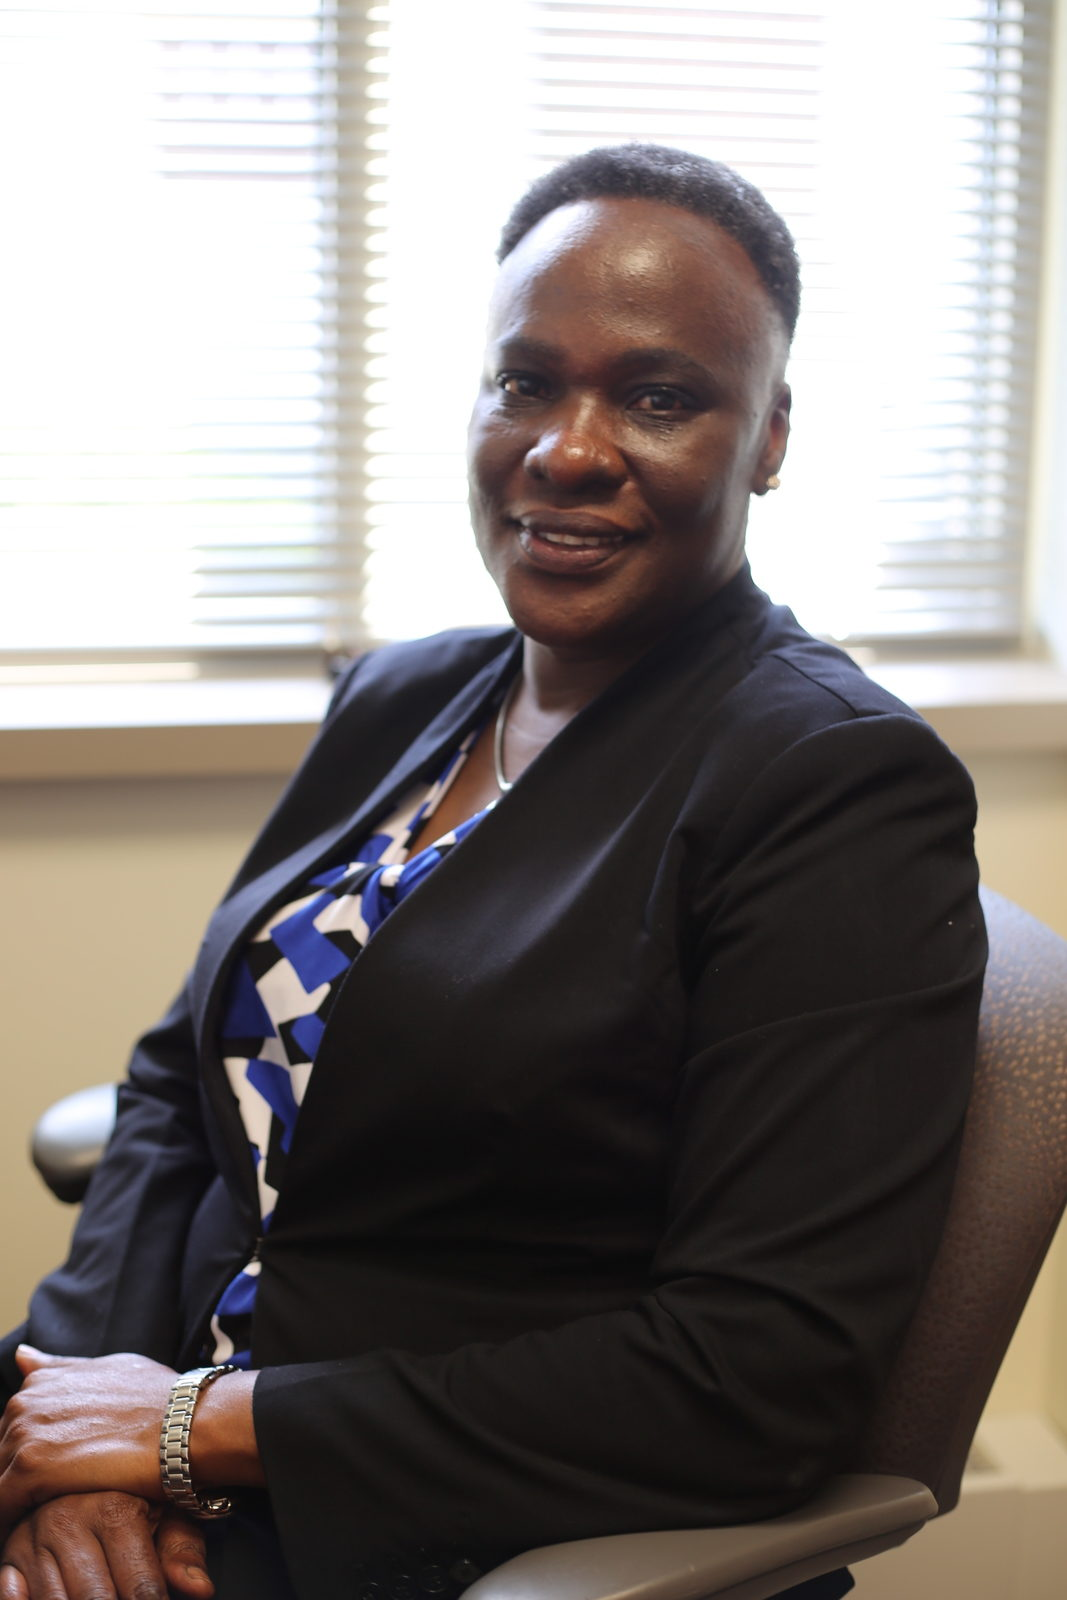 Michelle McAnuff-Gumbs, Associate Professor of Literacy and Graduate Literacy Program Co-Chair